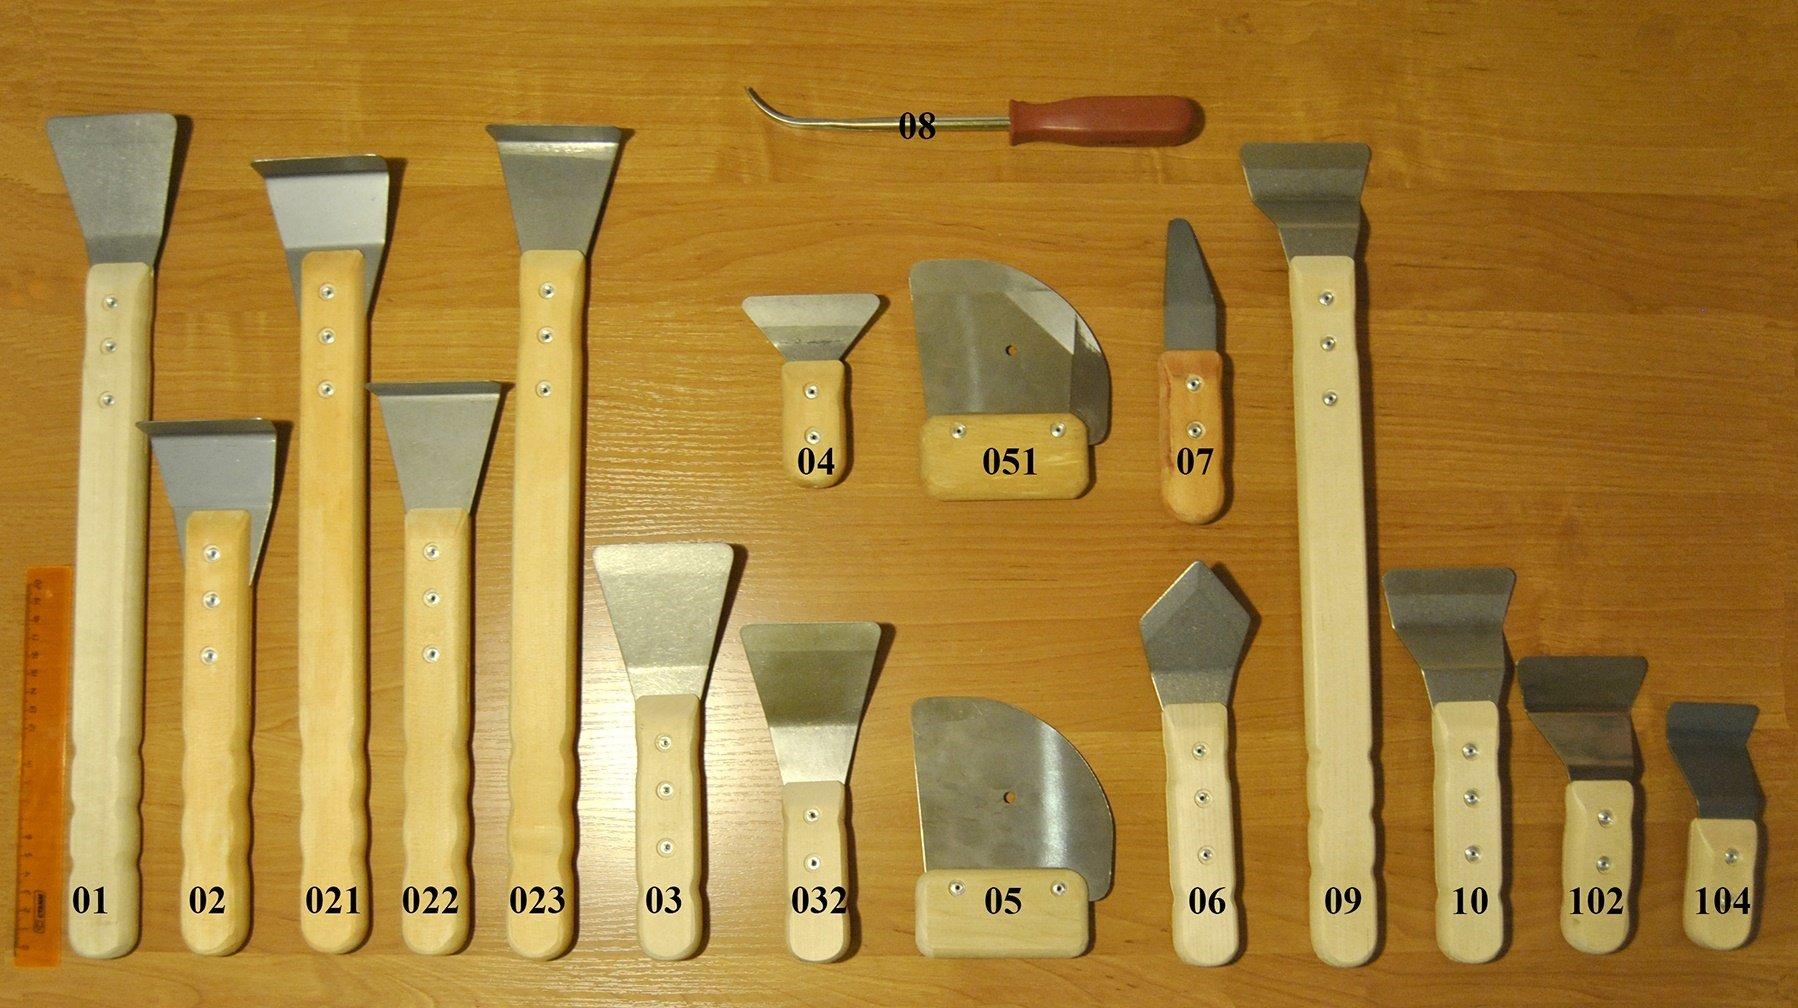 Sharp ремонт своими руками 198